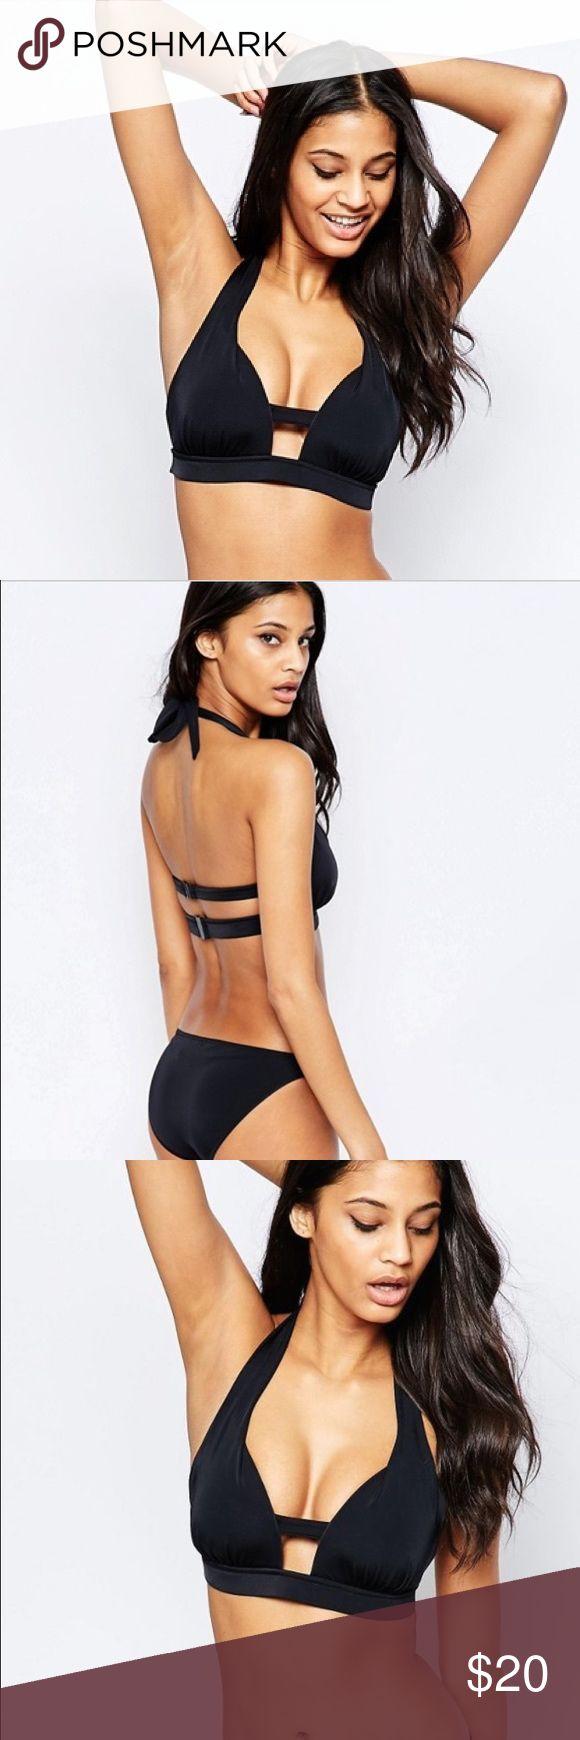 ASOS Fuller Bust Lattice Moulded Bikini Top This bikini top is perfect for someo...